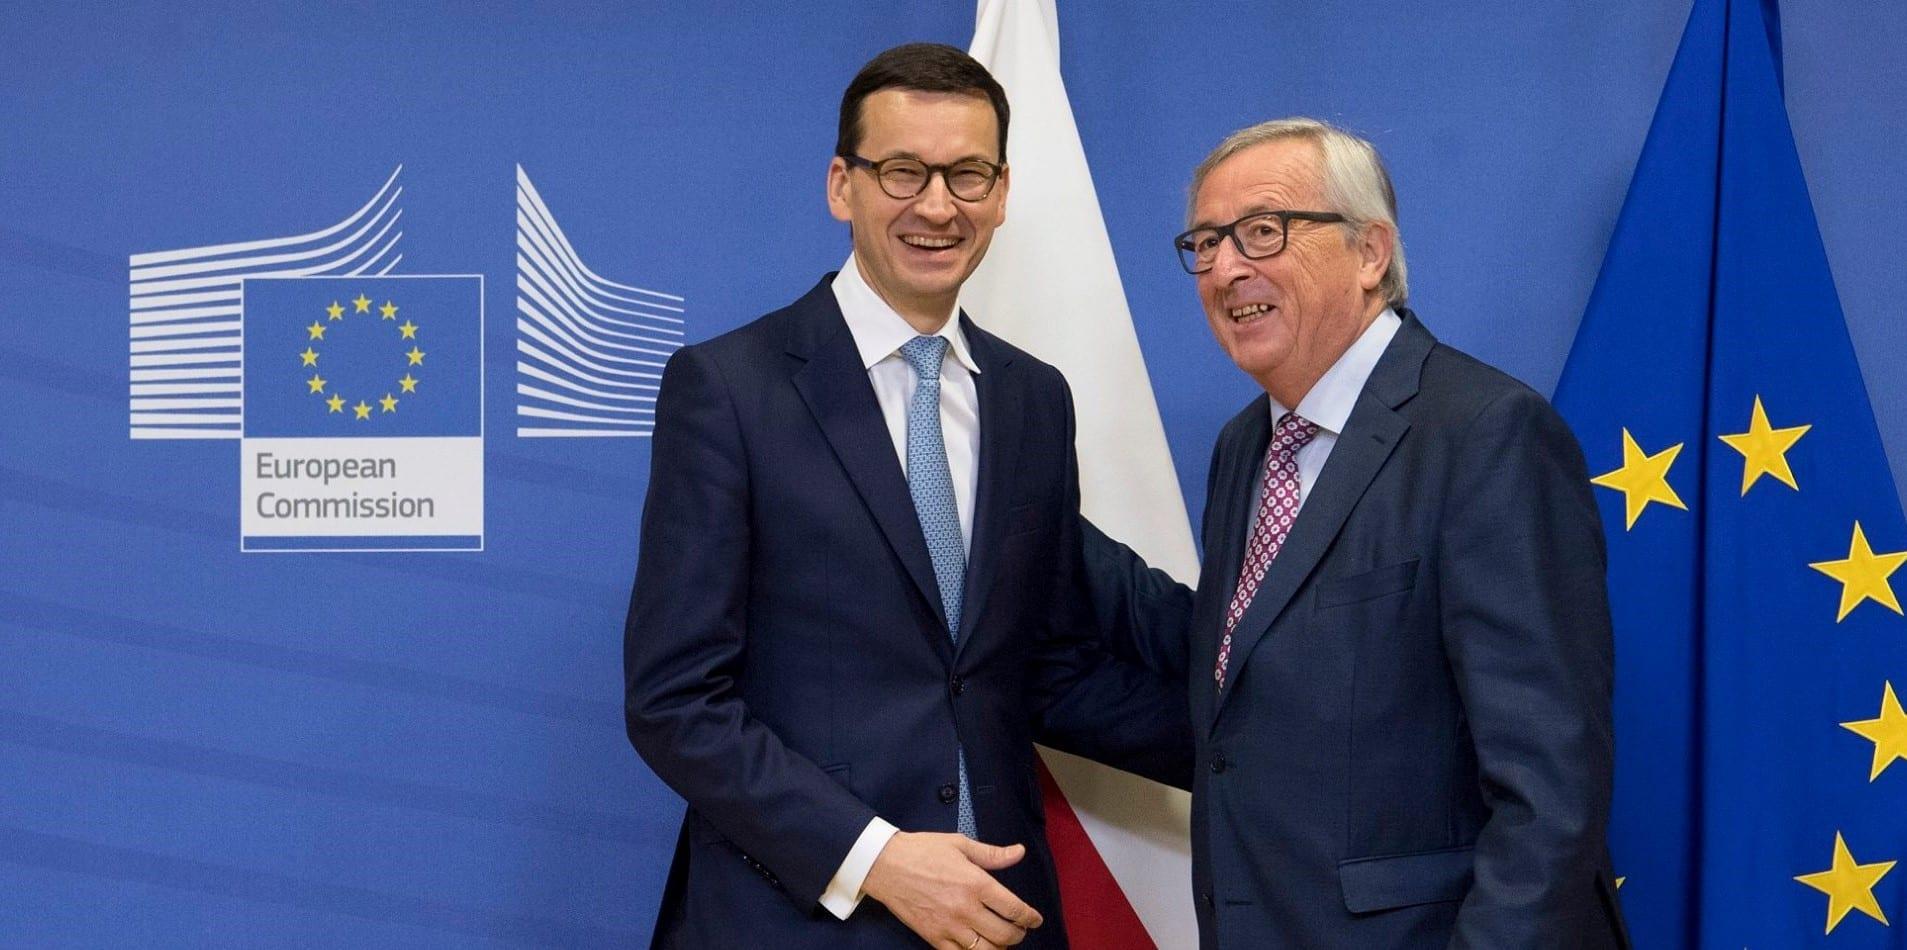 polen_statsminister_og_juncker_eu_artikel_7